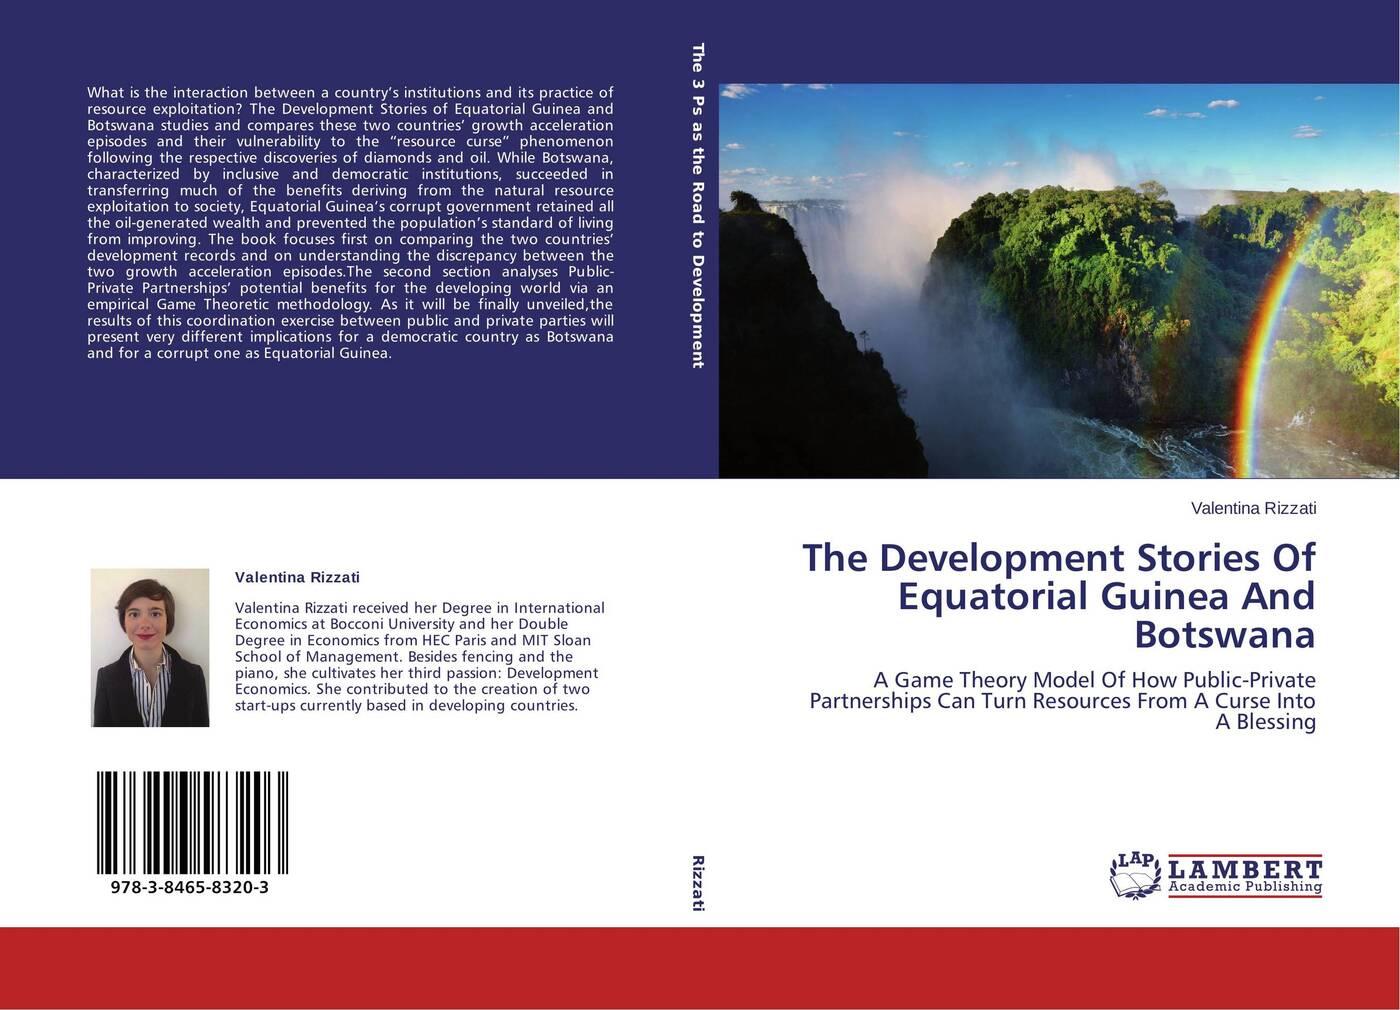 Valentina Rizzati The Development Stories Of Equatorial Guinea And Botswana цена